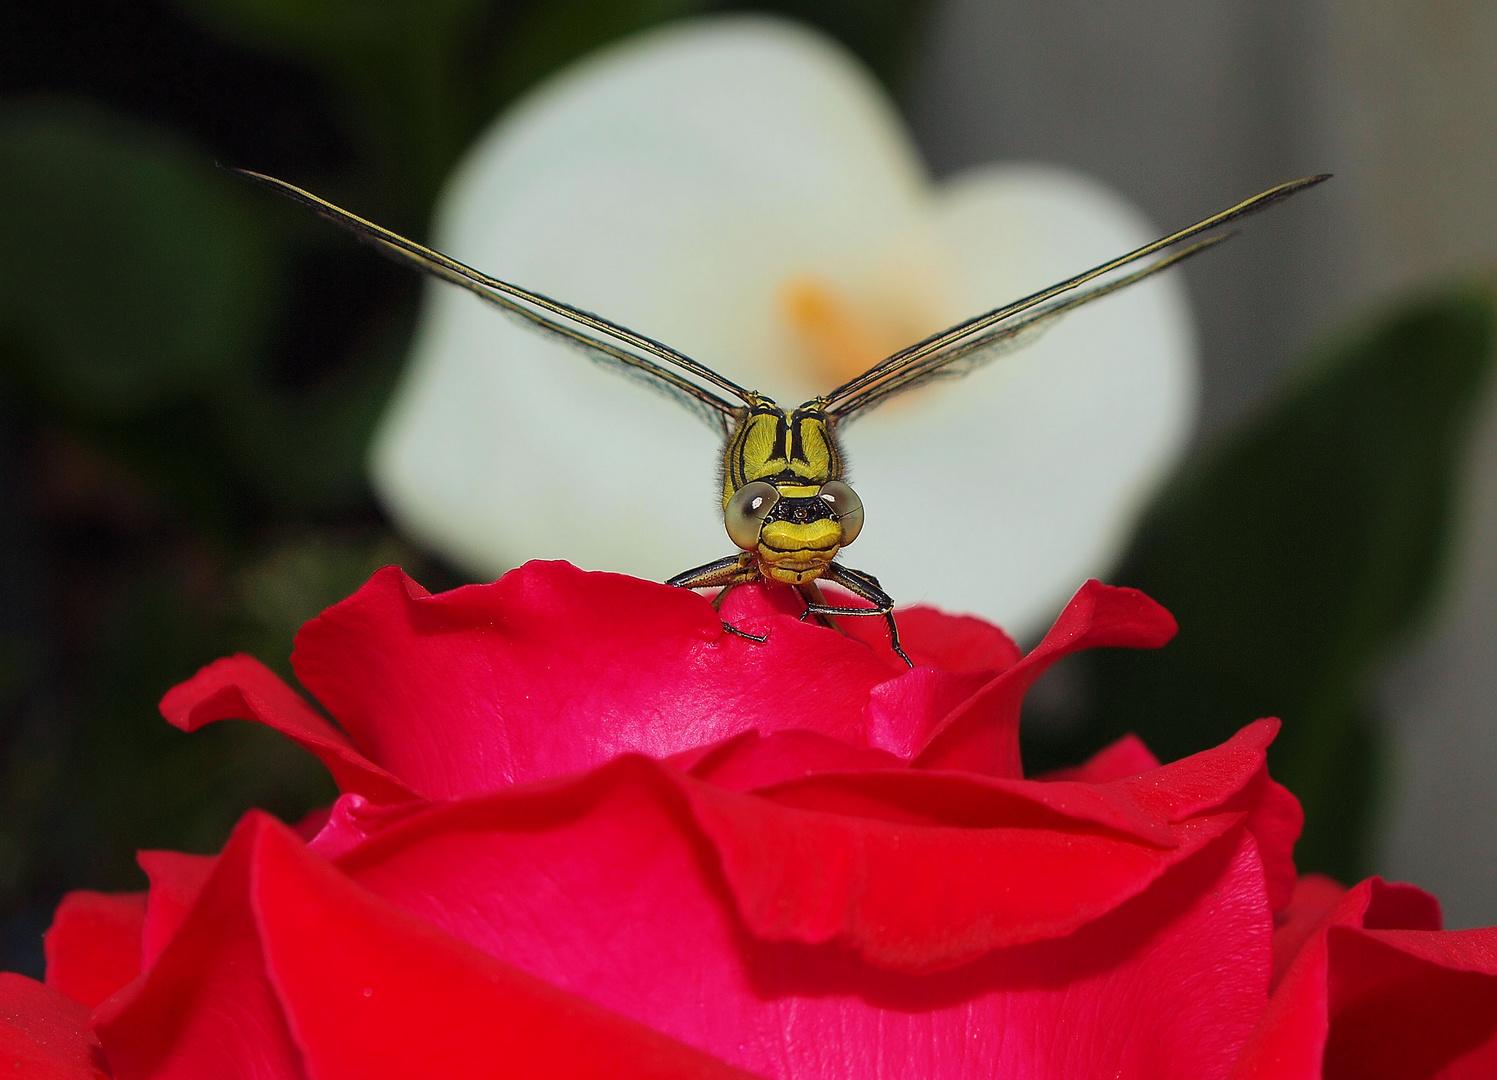 special libellules http://neo85746.skyrock.com/